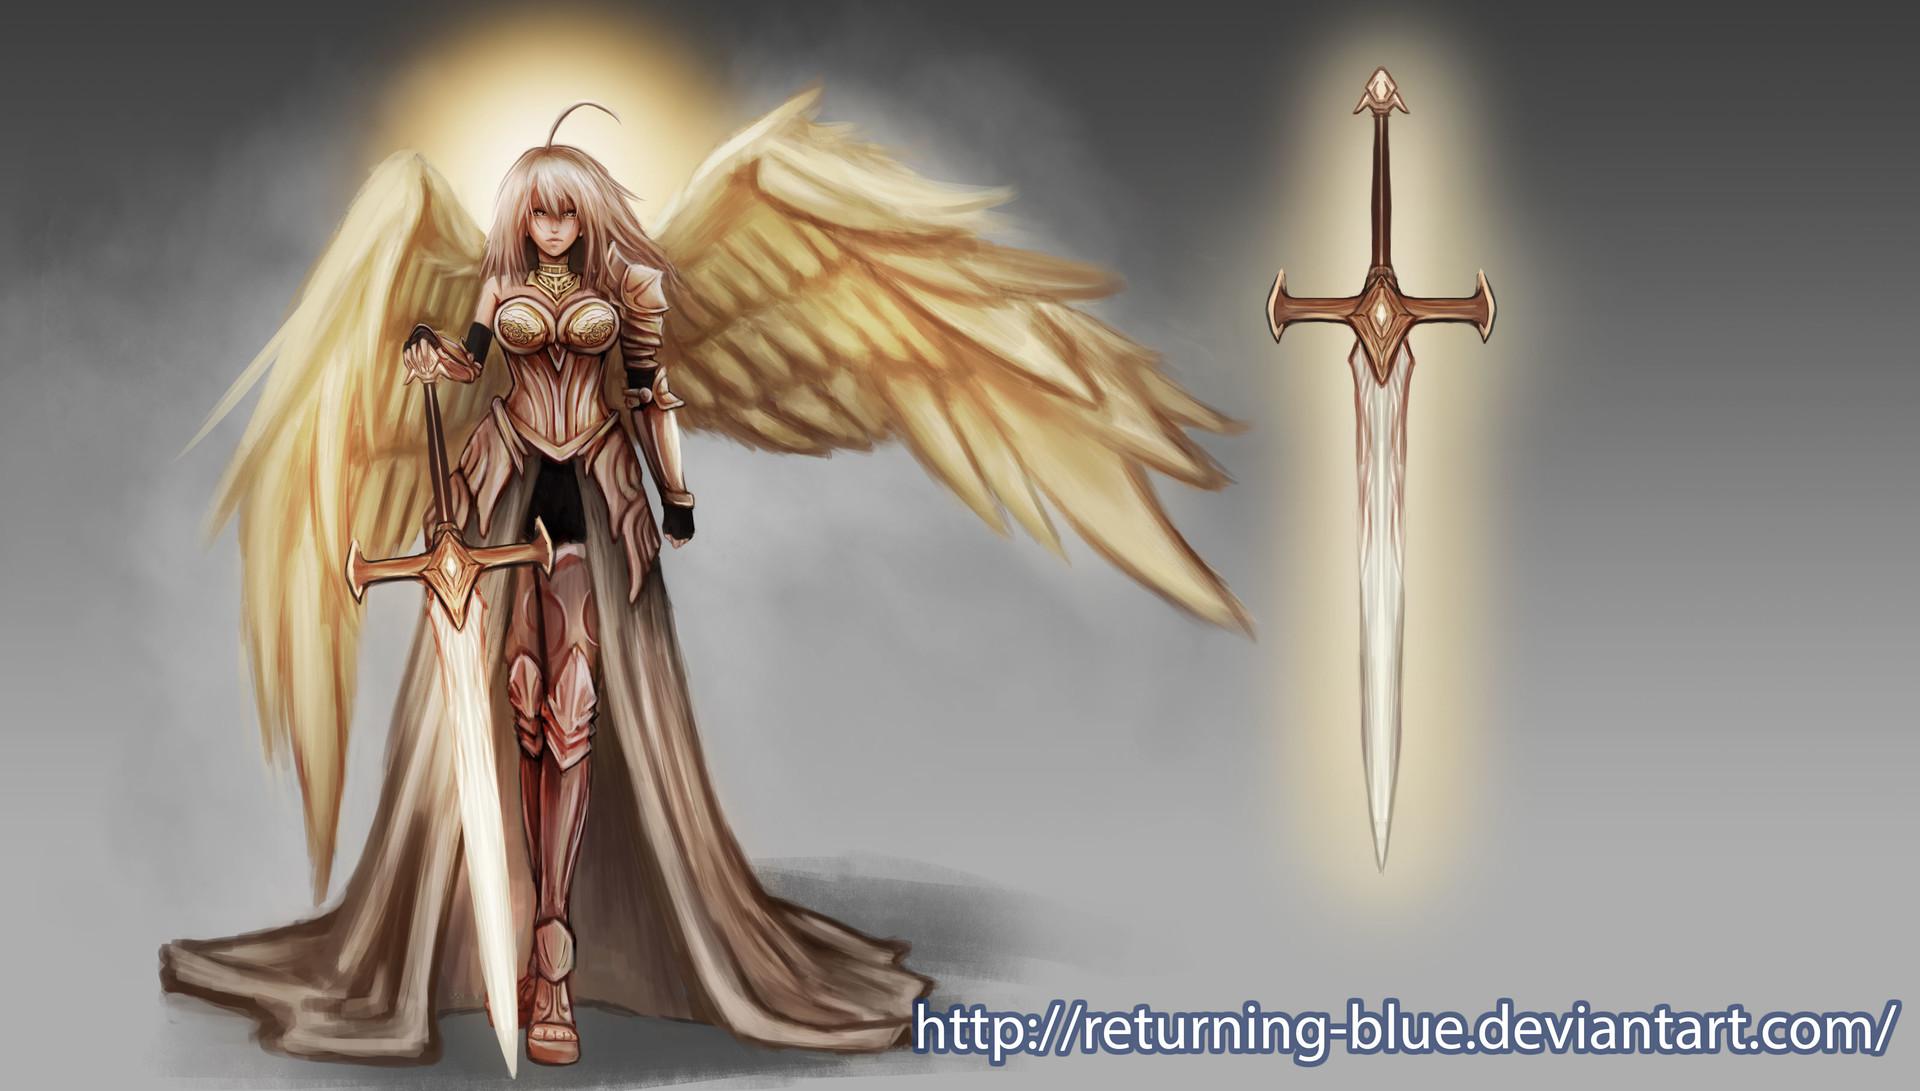 Dix shou angel adoptalbe lt